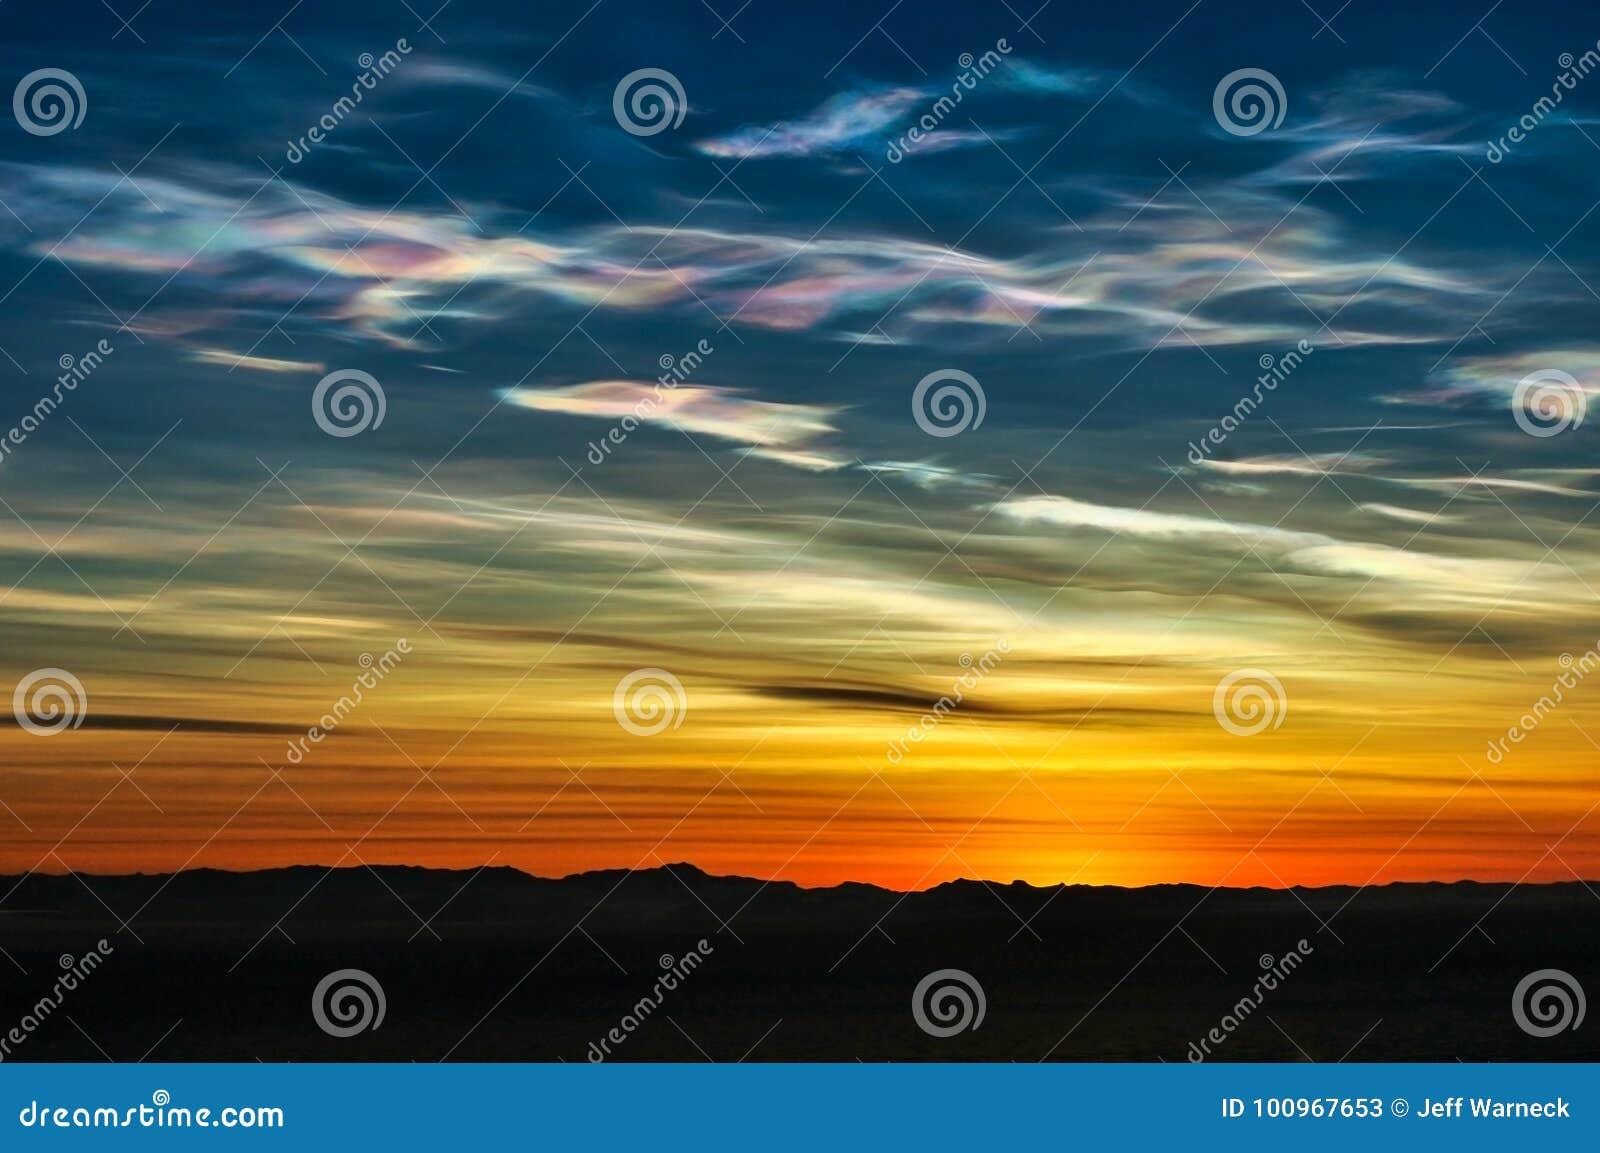 Nacreous cloud formation